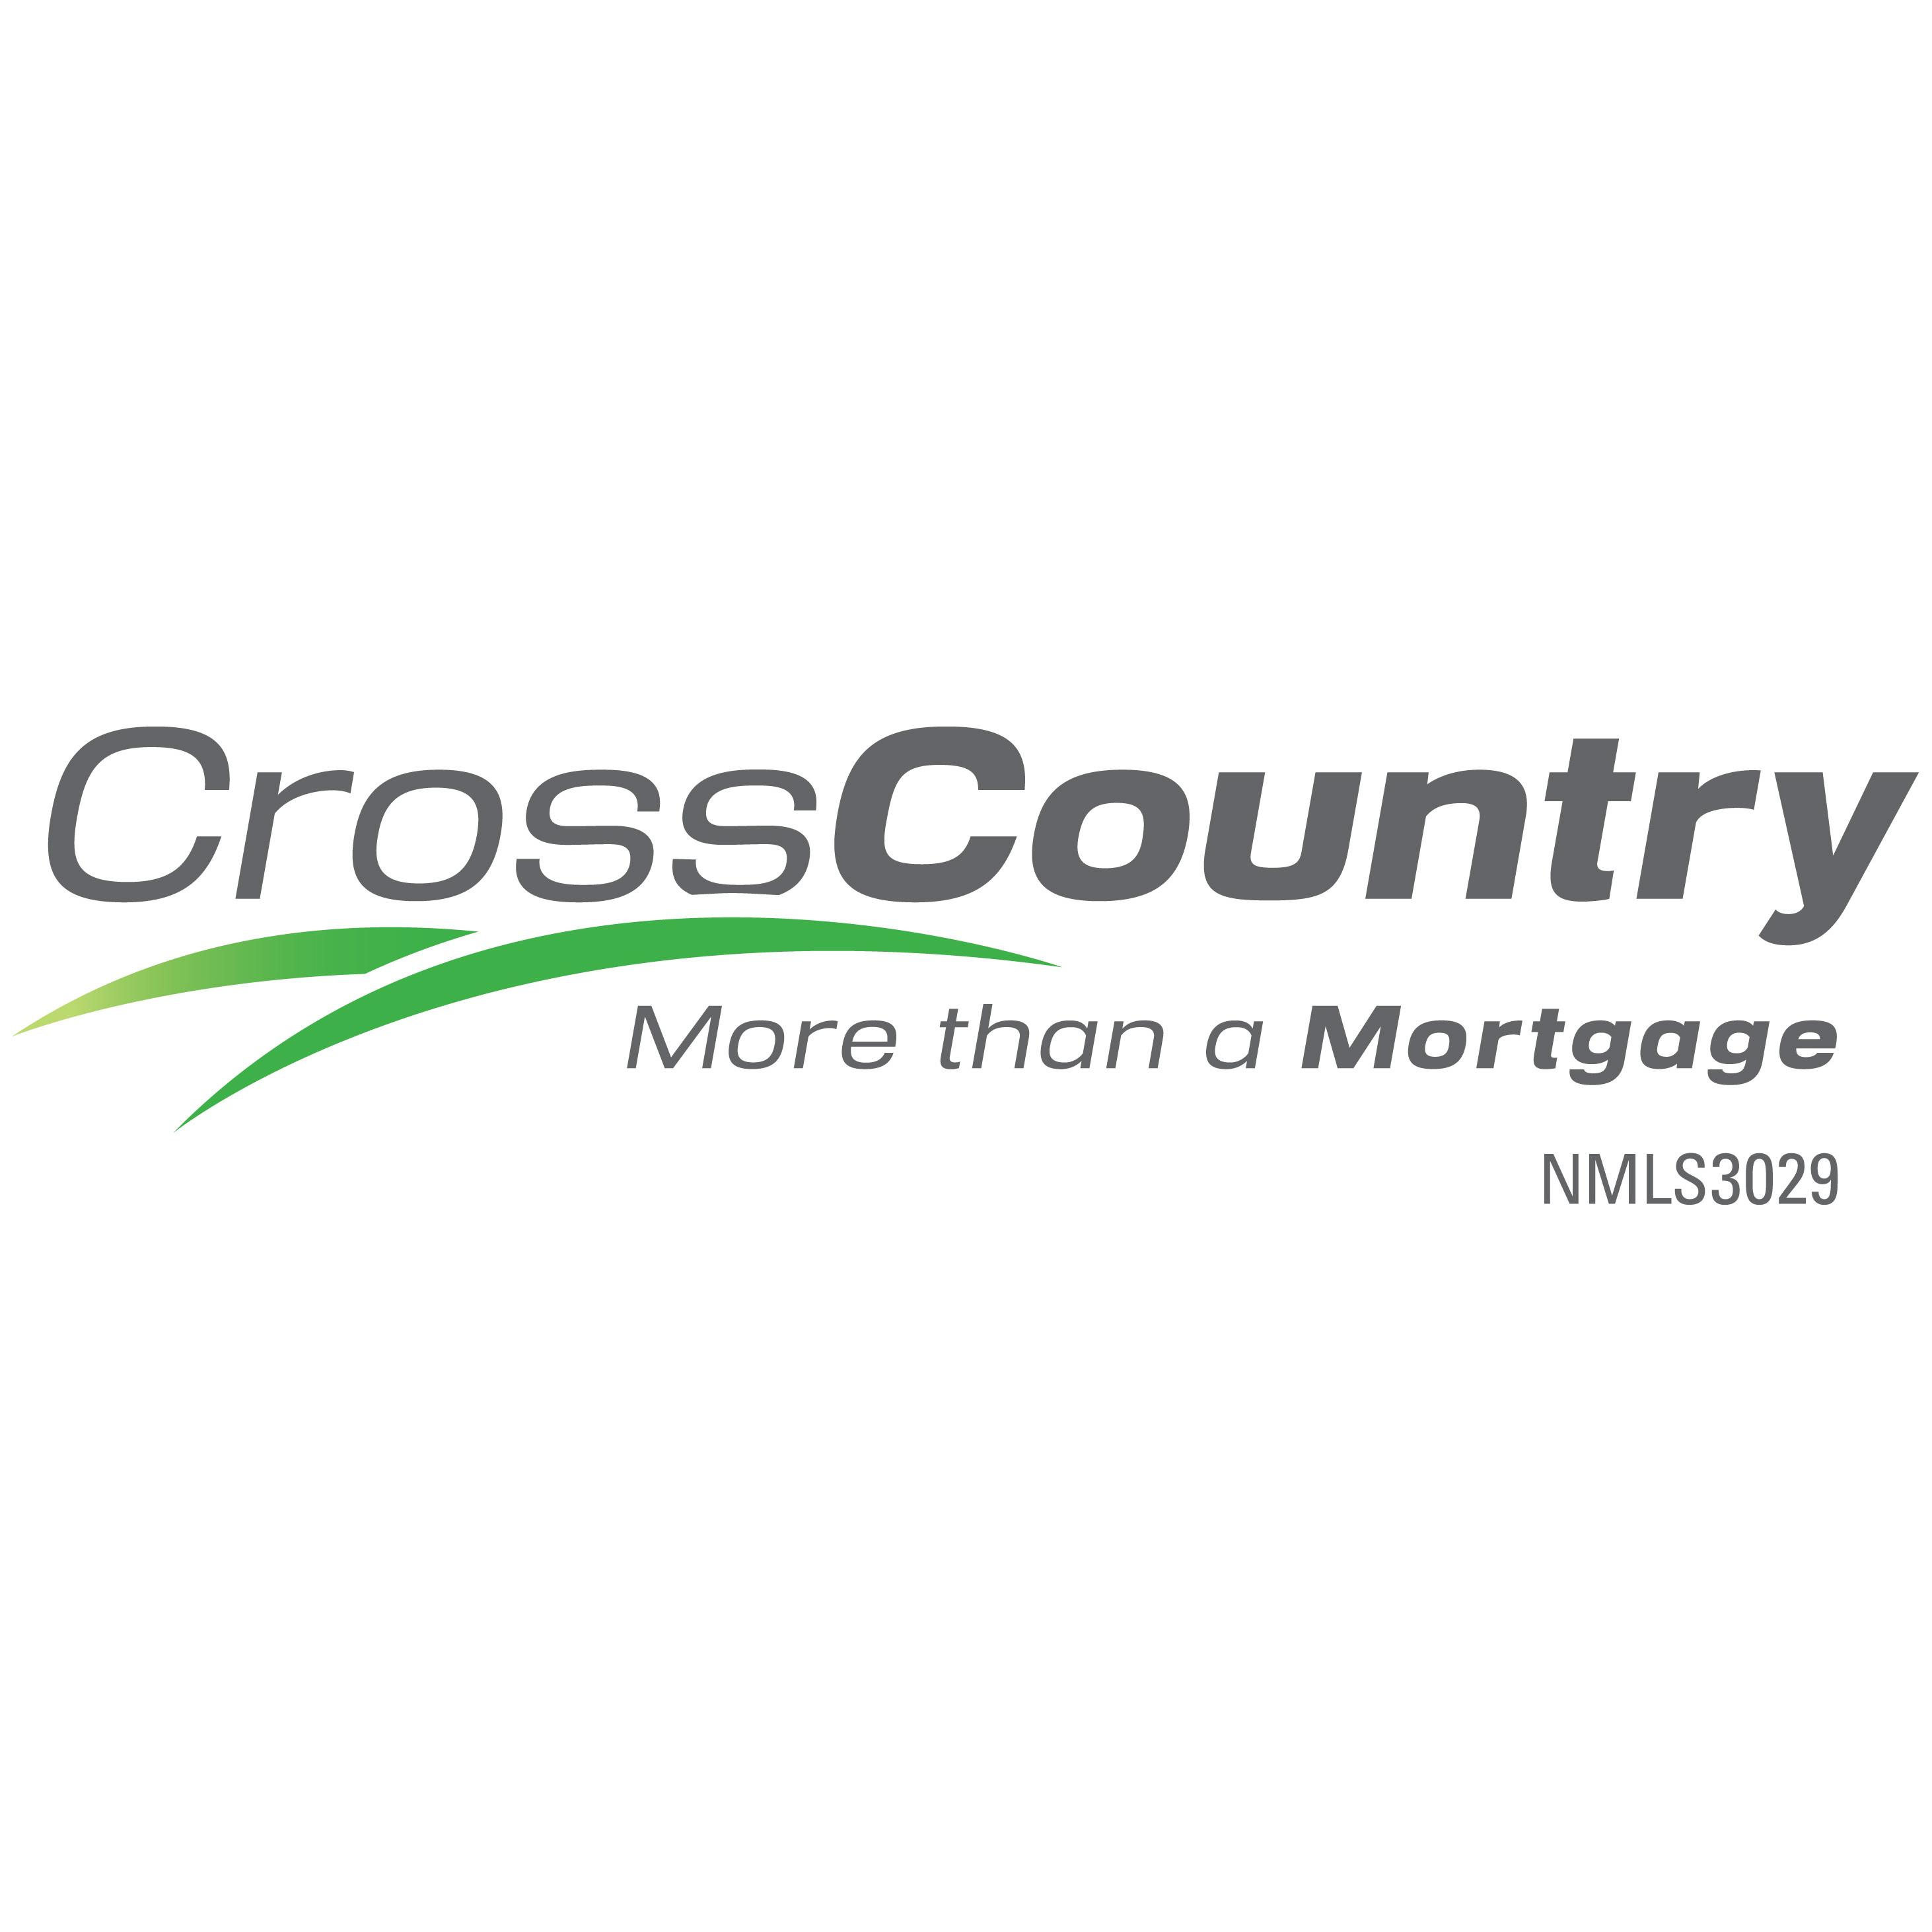 Marie-Lynn Dunn, Mortgage Loan Officer